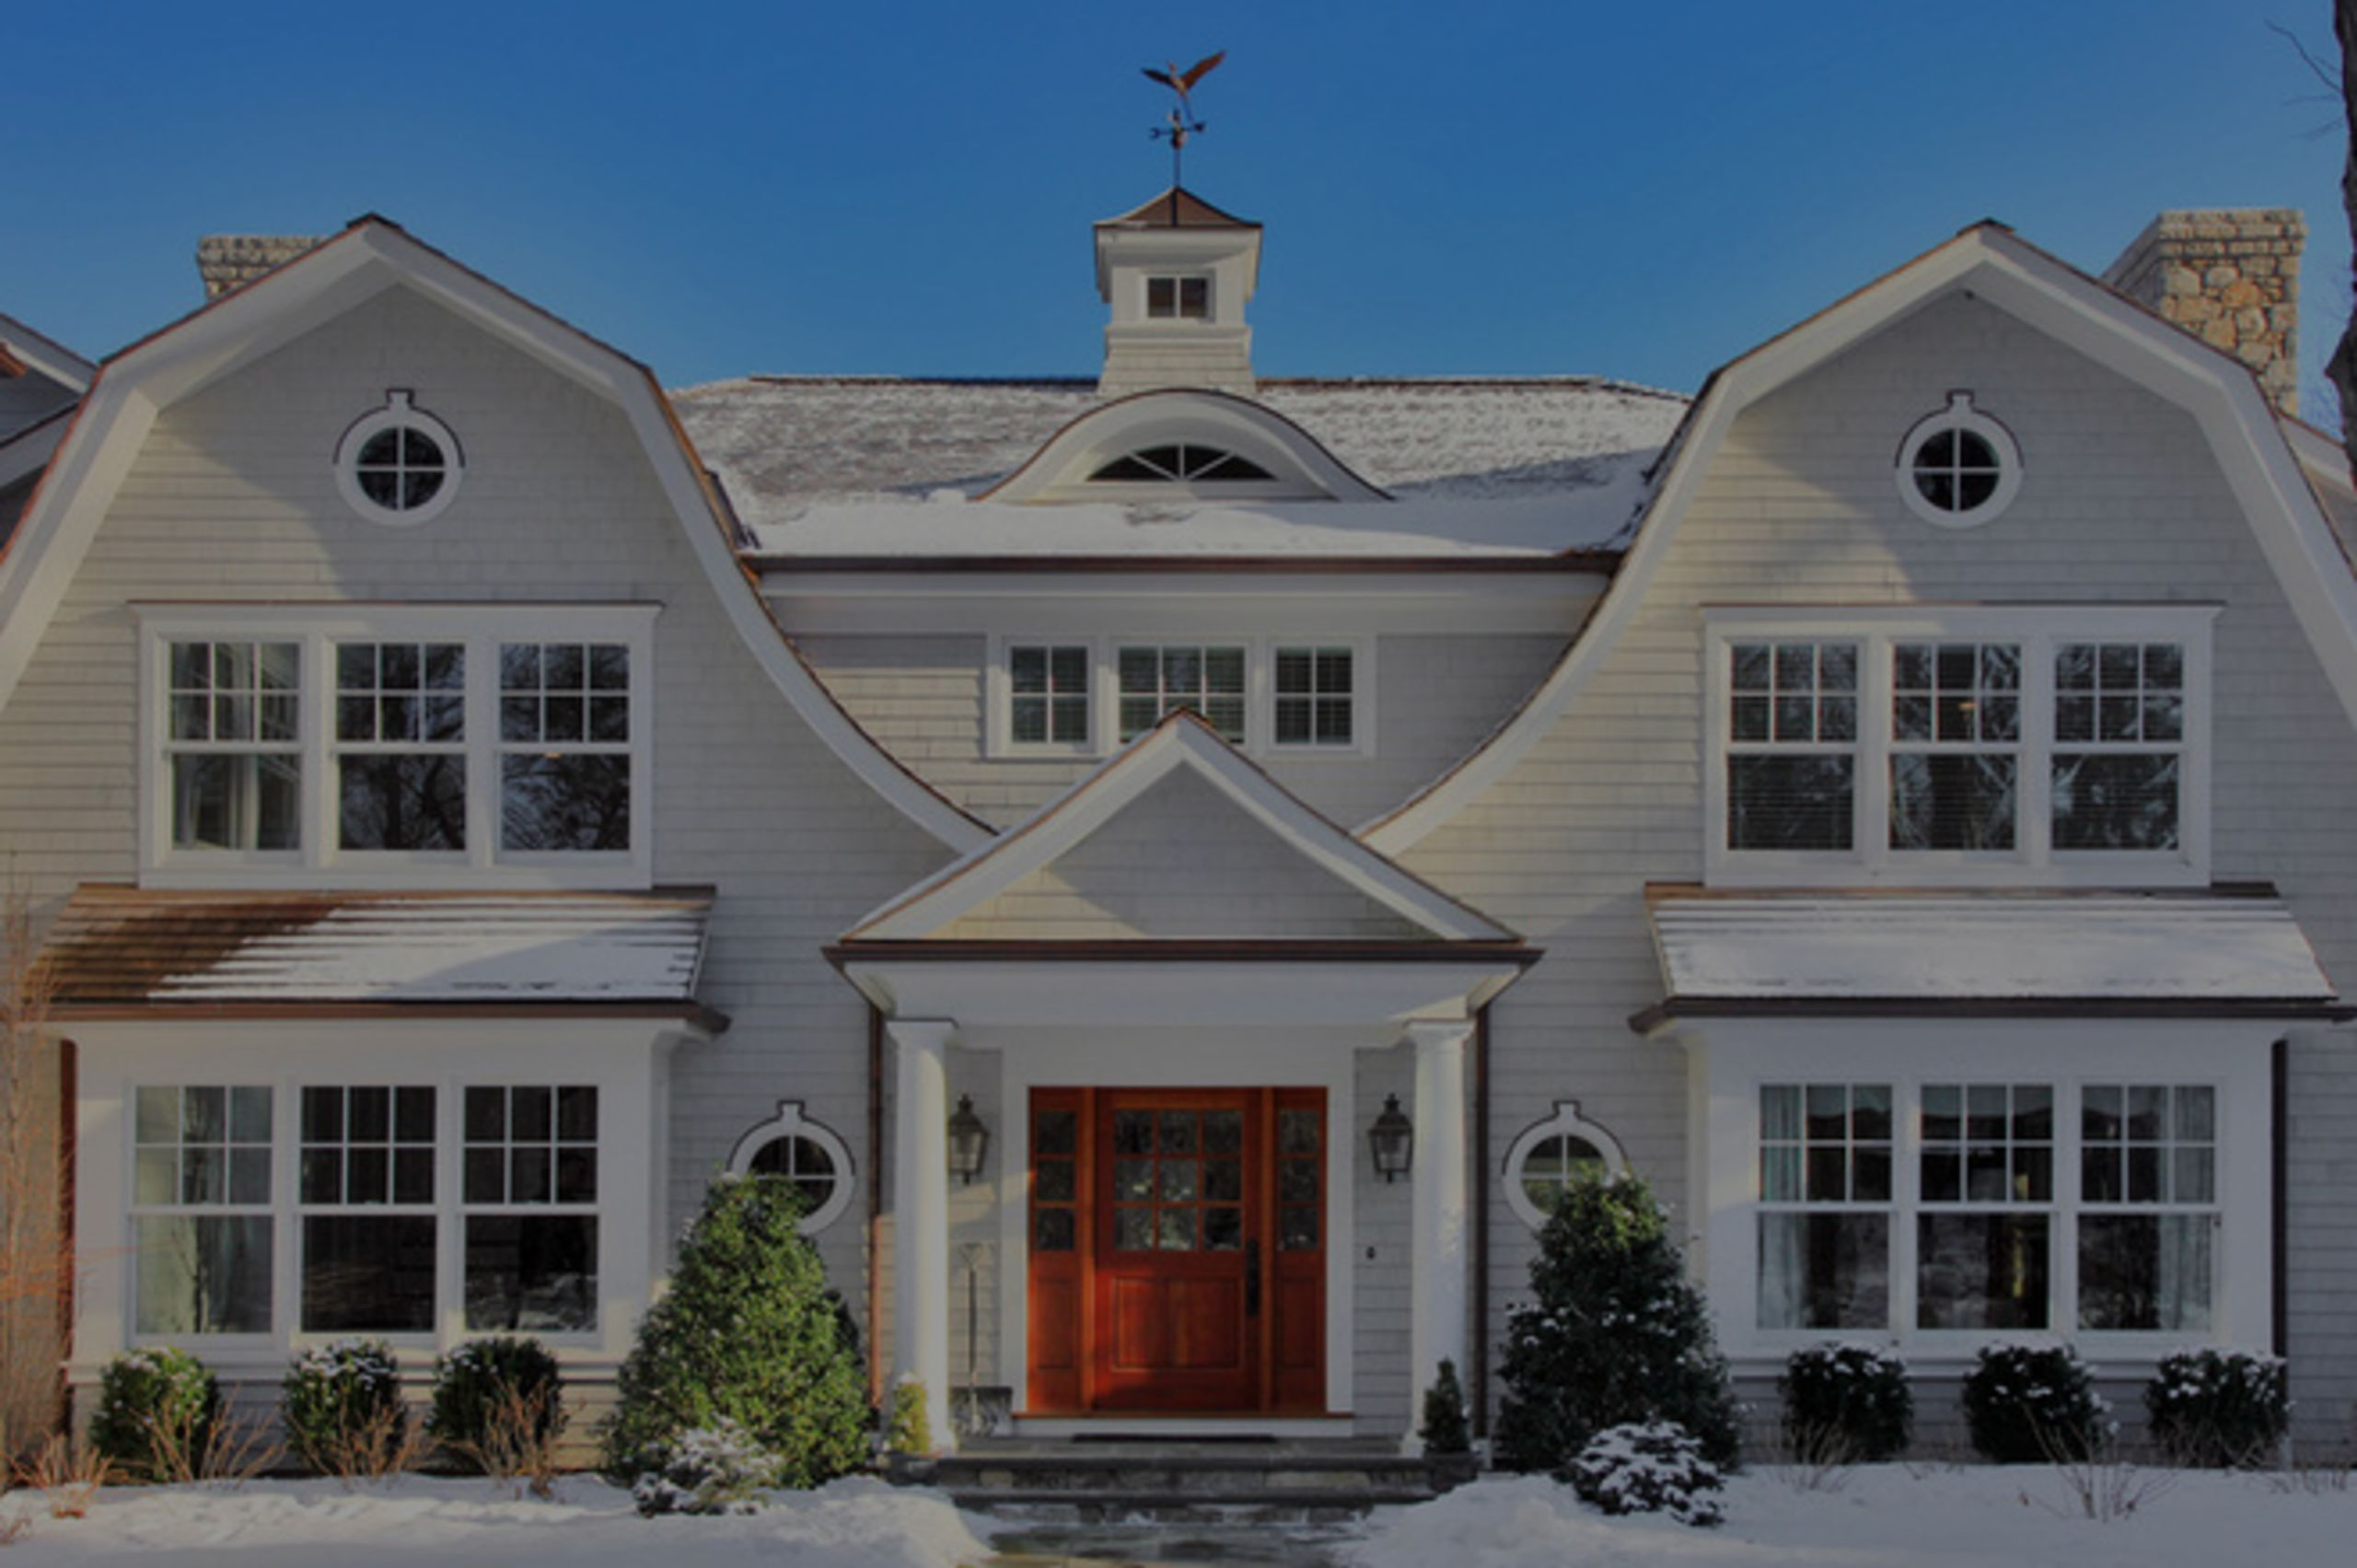 February Home Check lists